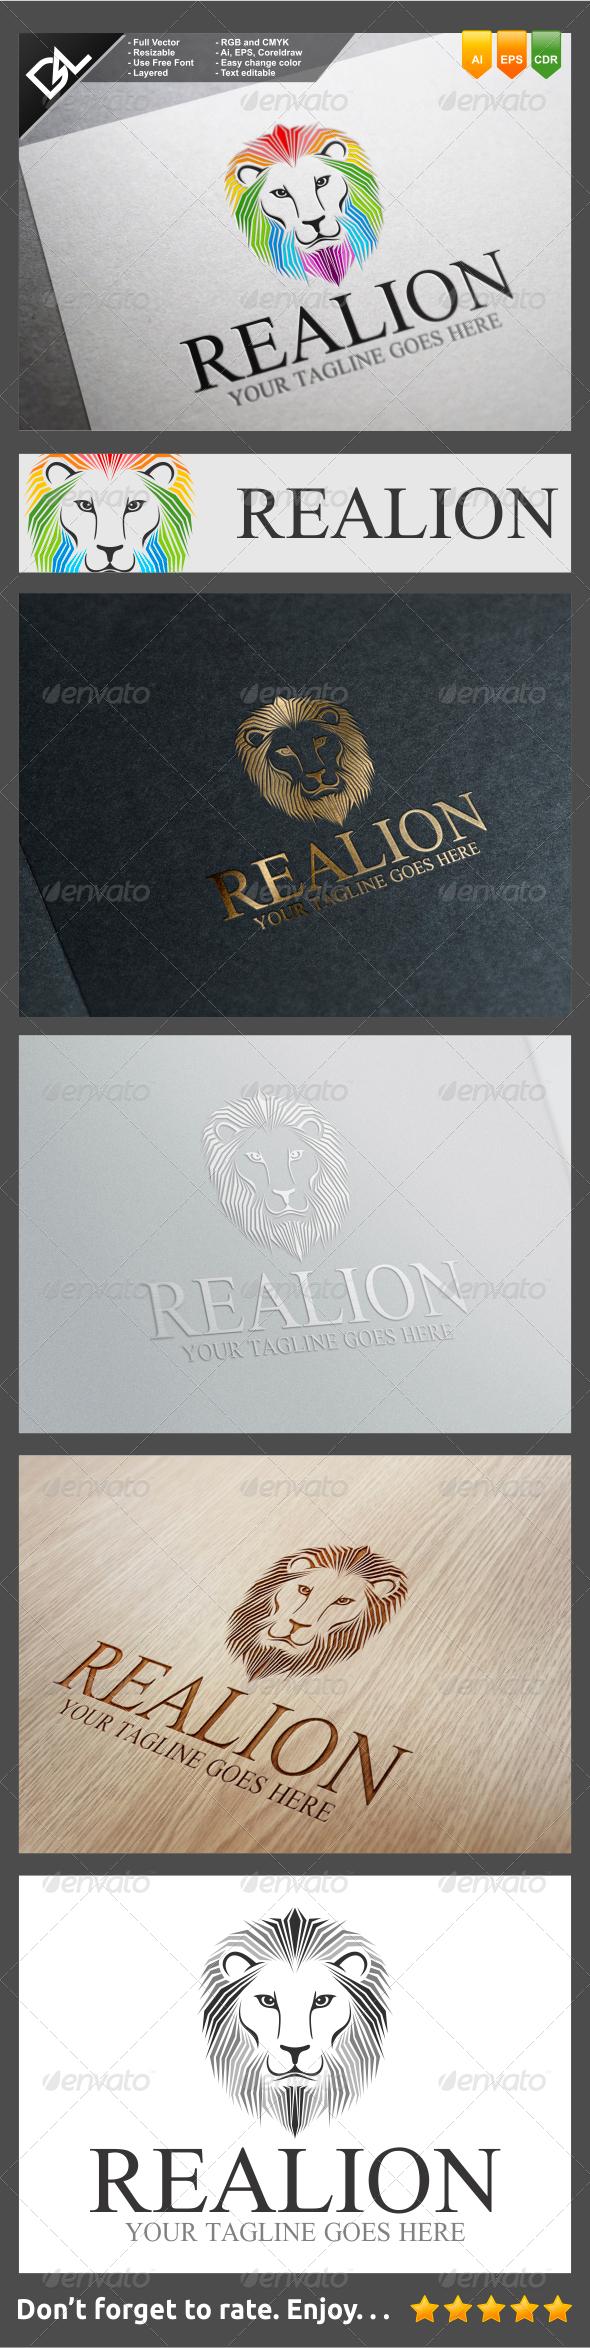 Realion